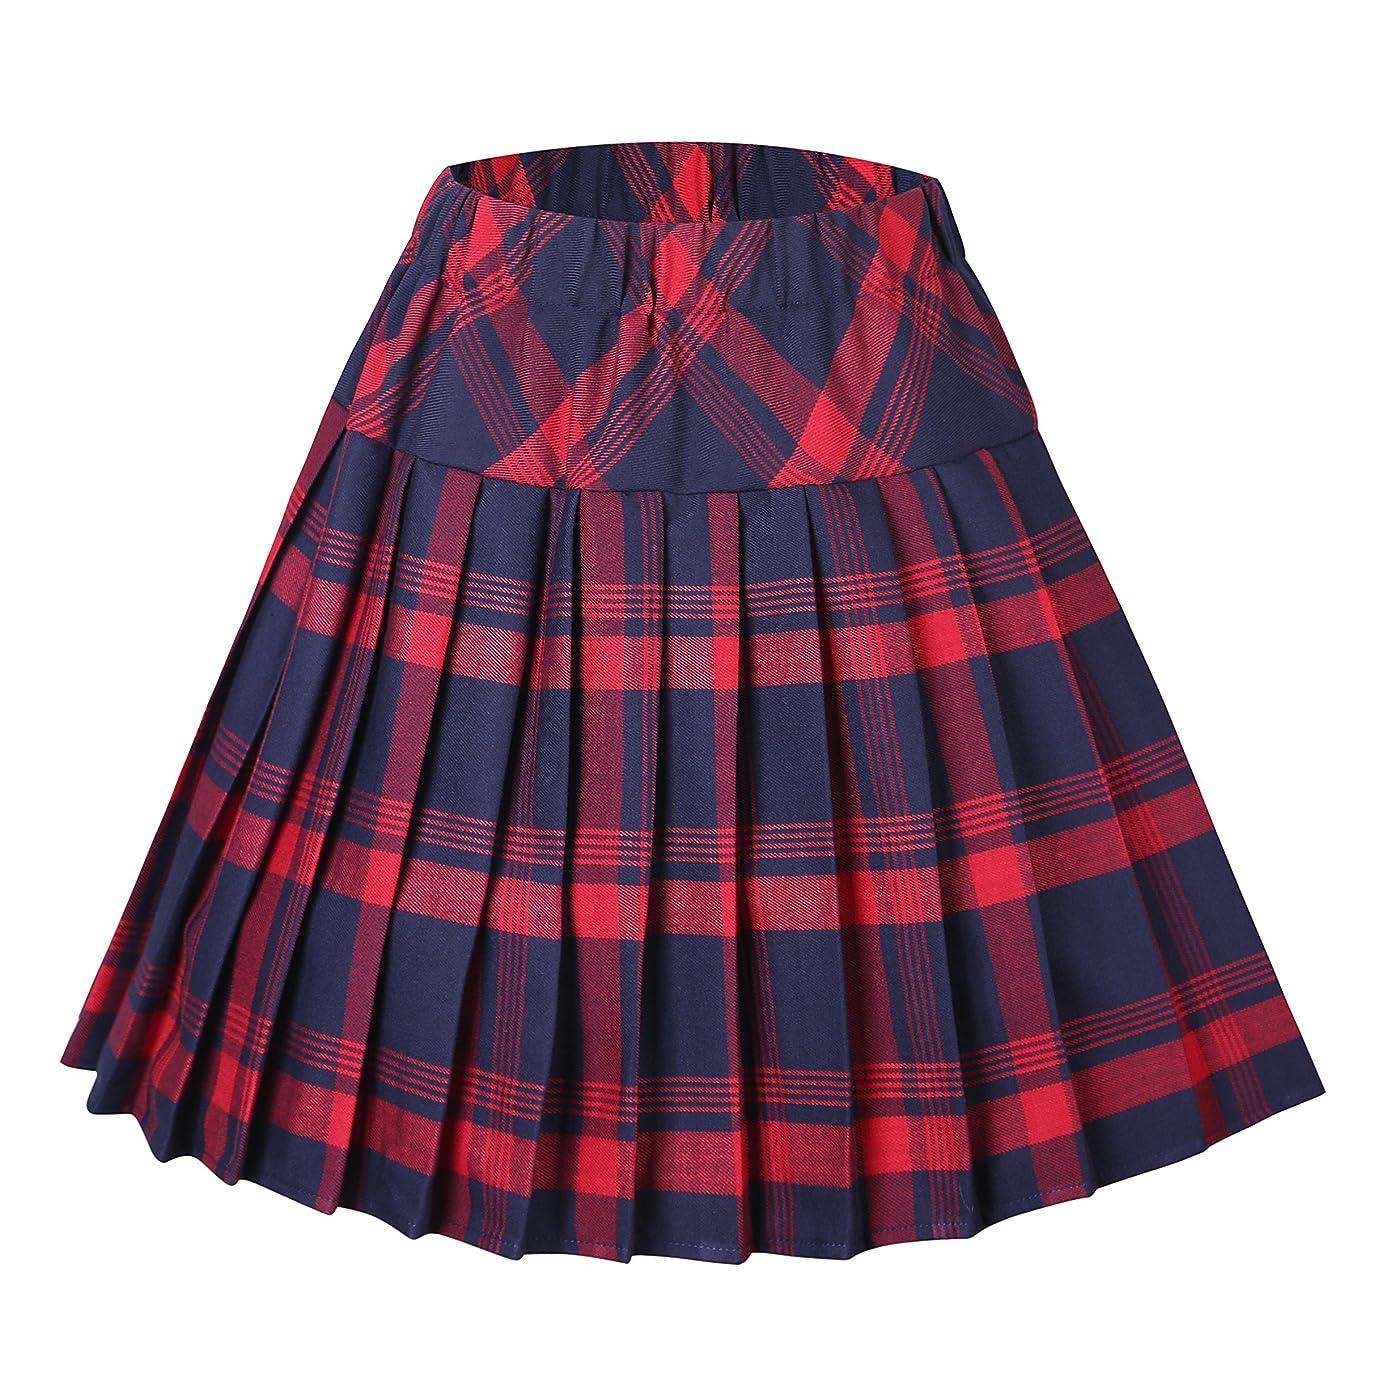 Women's Tartan Elastic Pleated Plaid Skirts Schoolgirls Mini A-line Skirt Cosplay Costumes